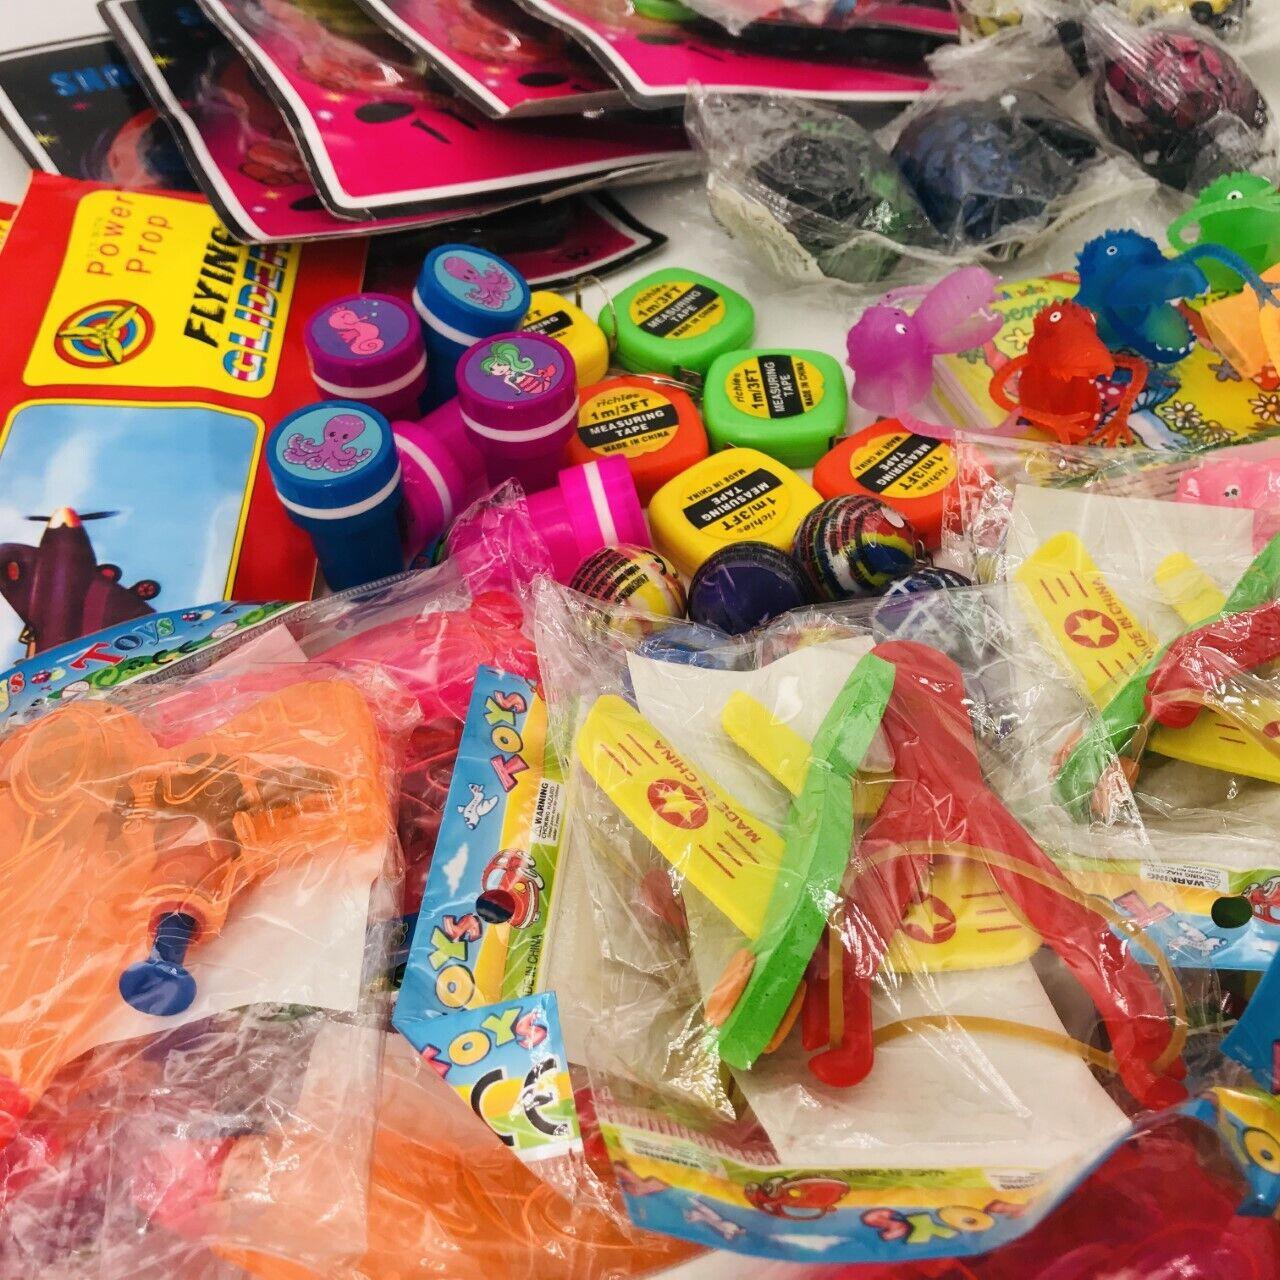 500 Teile Mitgebsel Kleinspielzeug Mix Beutel Kindergeburtstag Party Tombola